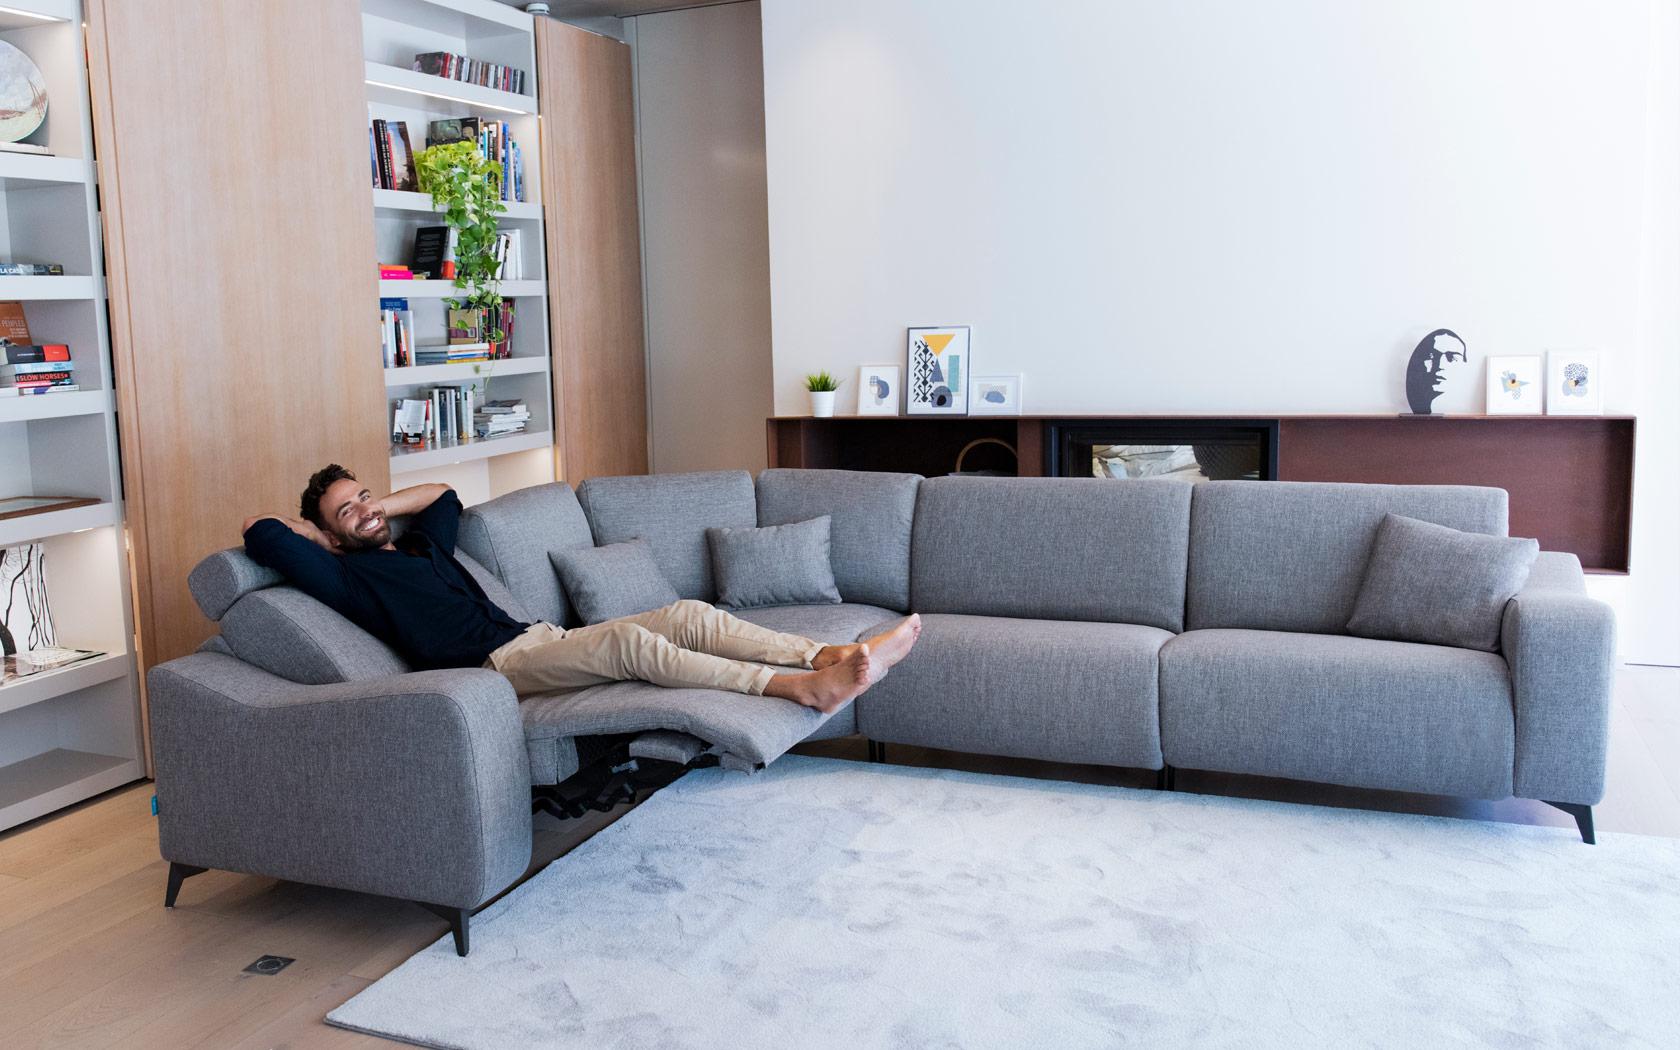 Atlanta sofa relax 2020 03